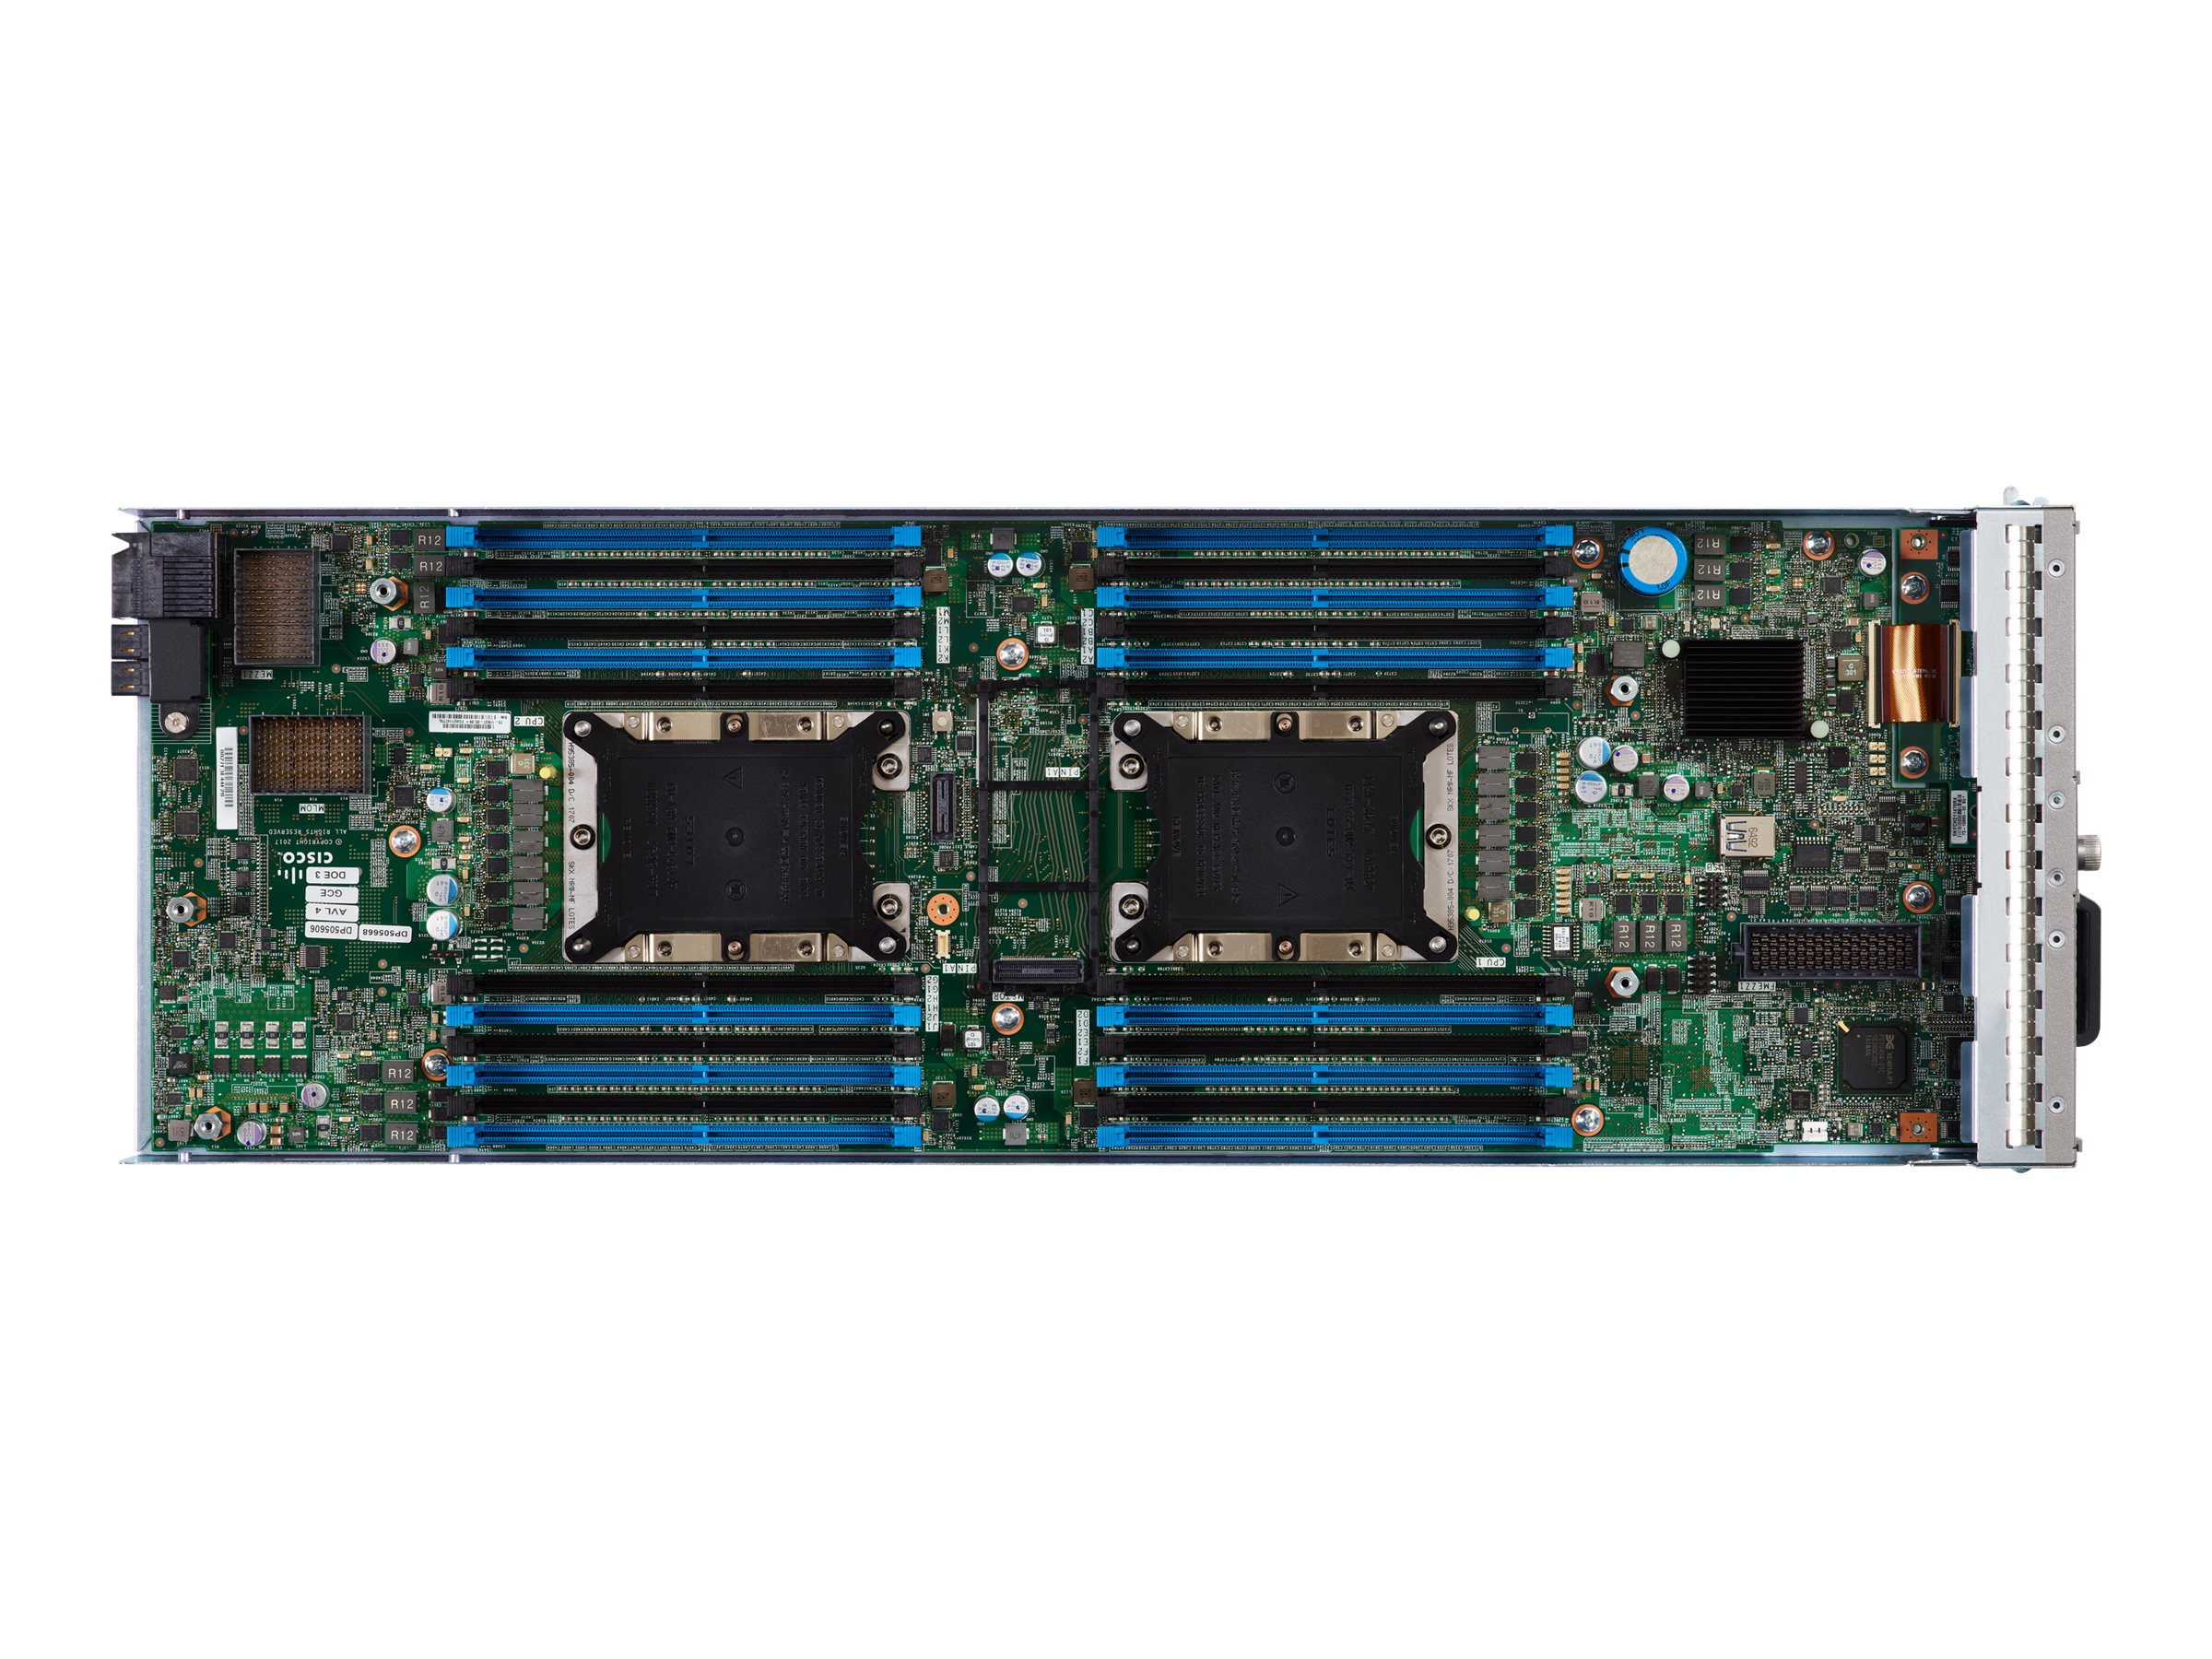 Cisco UCS B200 M5 Blade No CPU No RAM No HDDs 24xDIMM slots 2x2 5